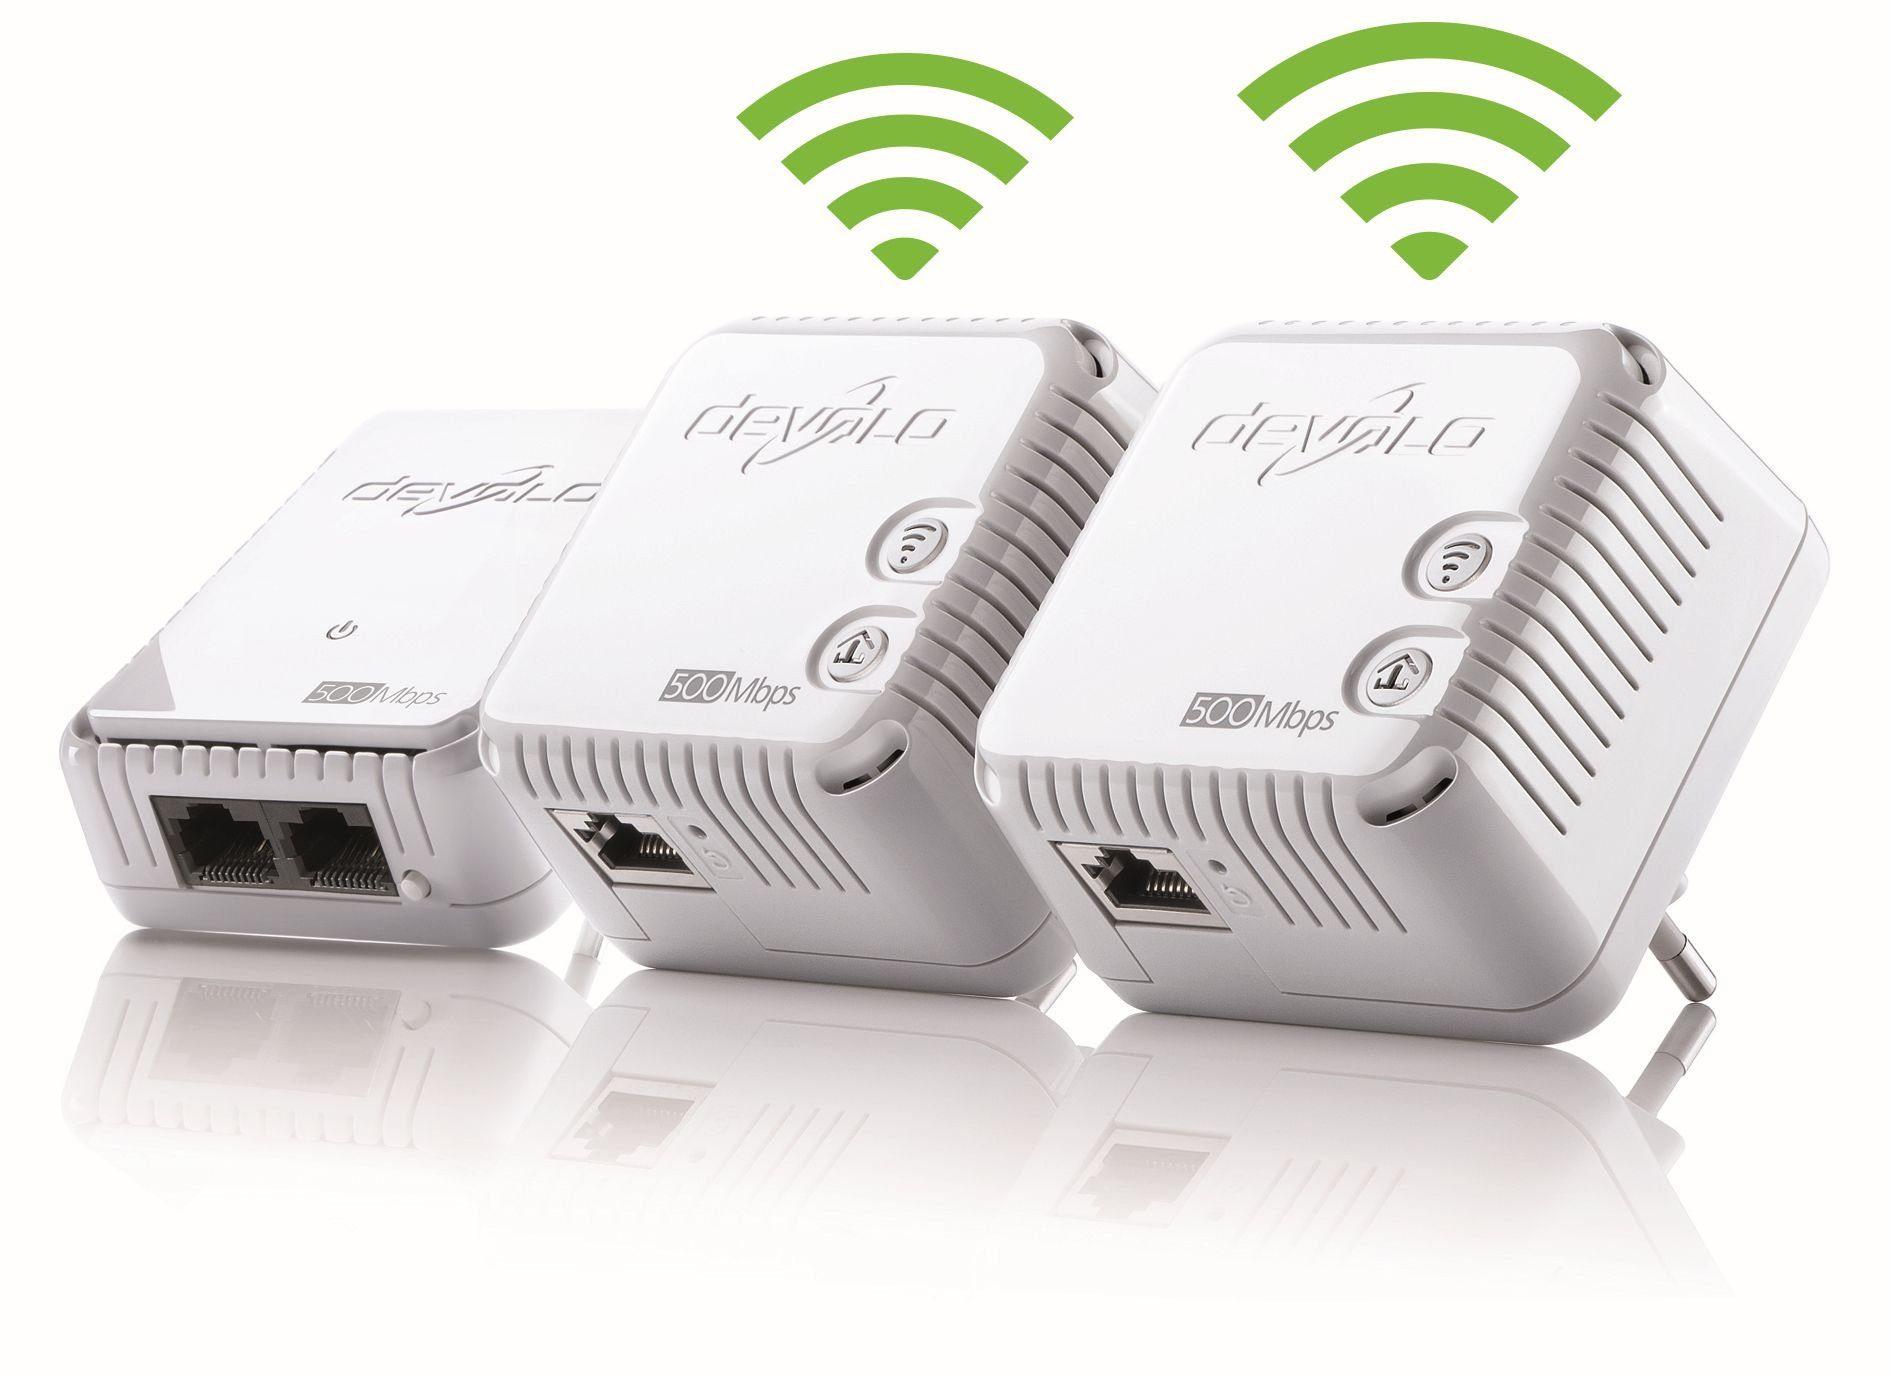 DEVOLO Powerline + WLAN »dLAN 500 WiFi Kit (500Mbit, 1xLAN, WLAN Repeater)«